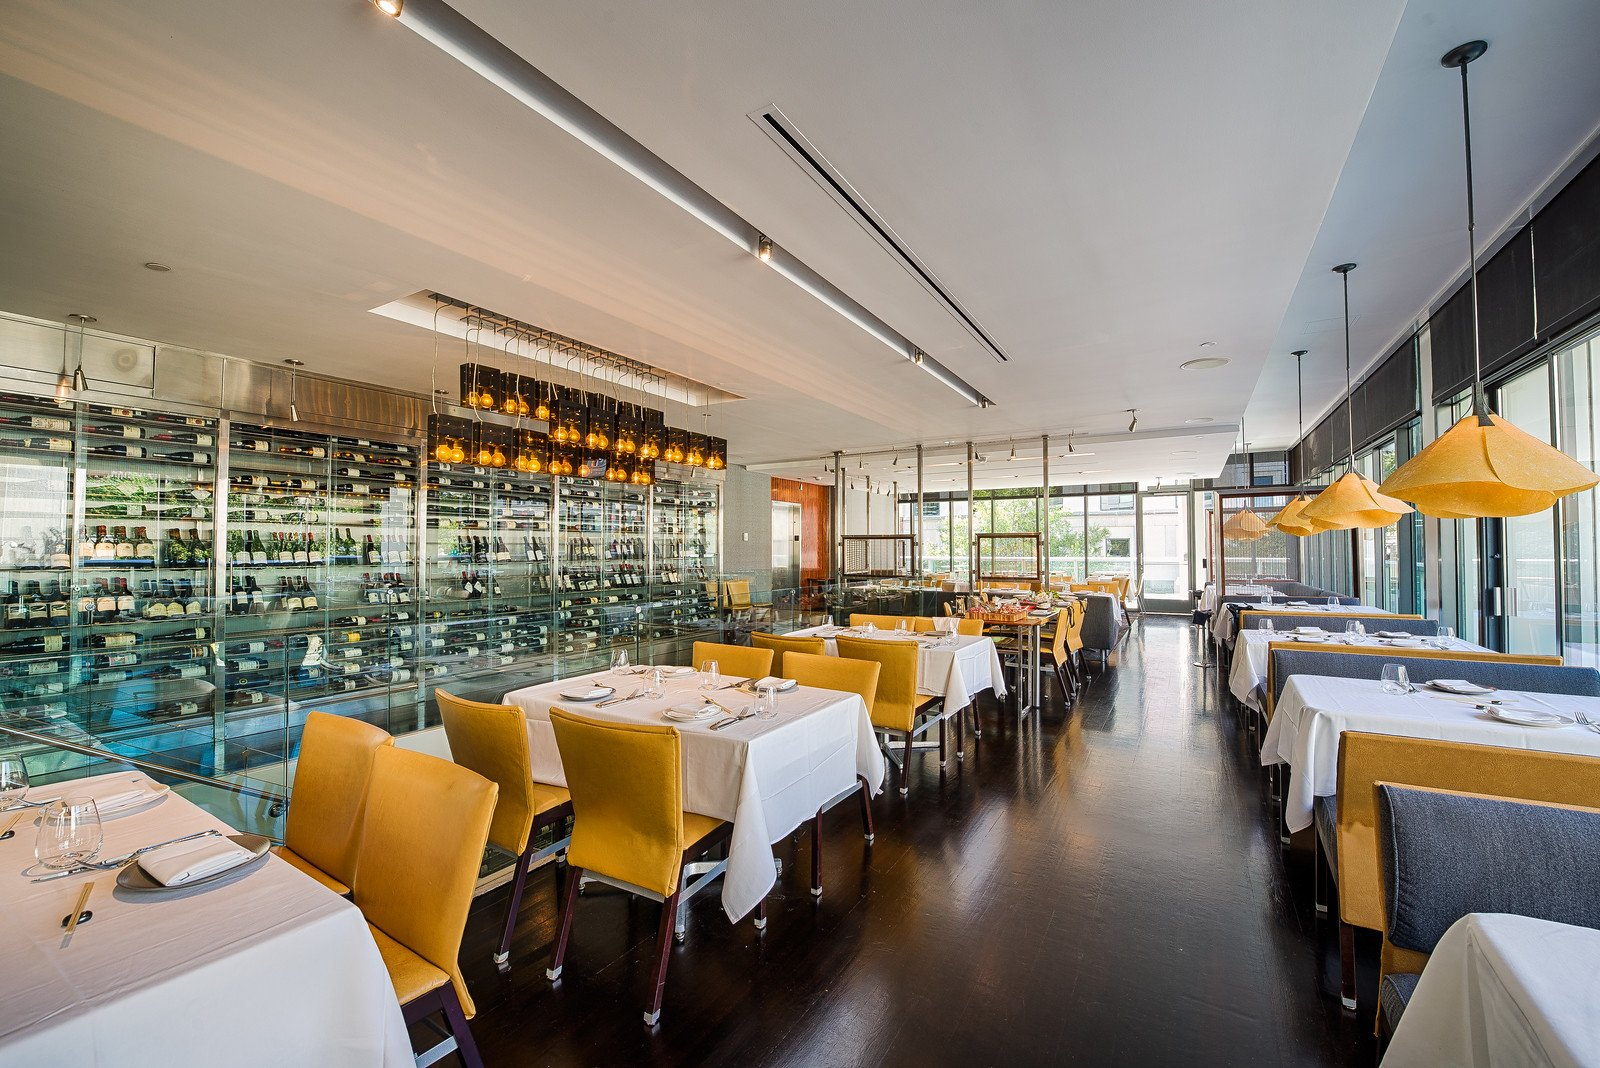 The 10 Best Restaurants Near Newseum TripAdvisor